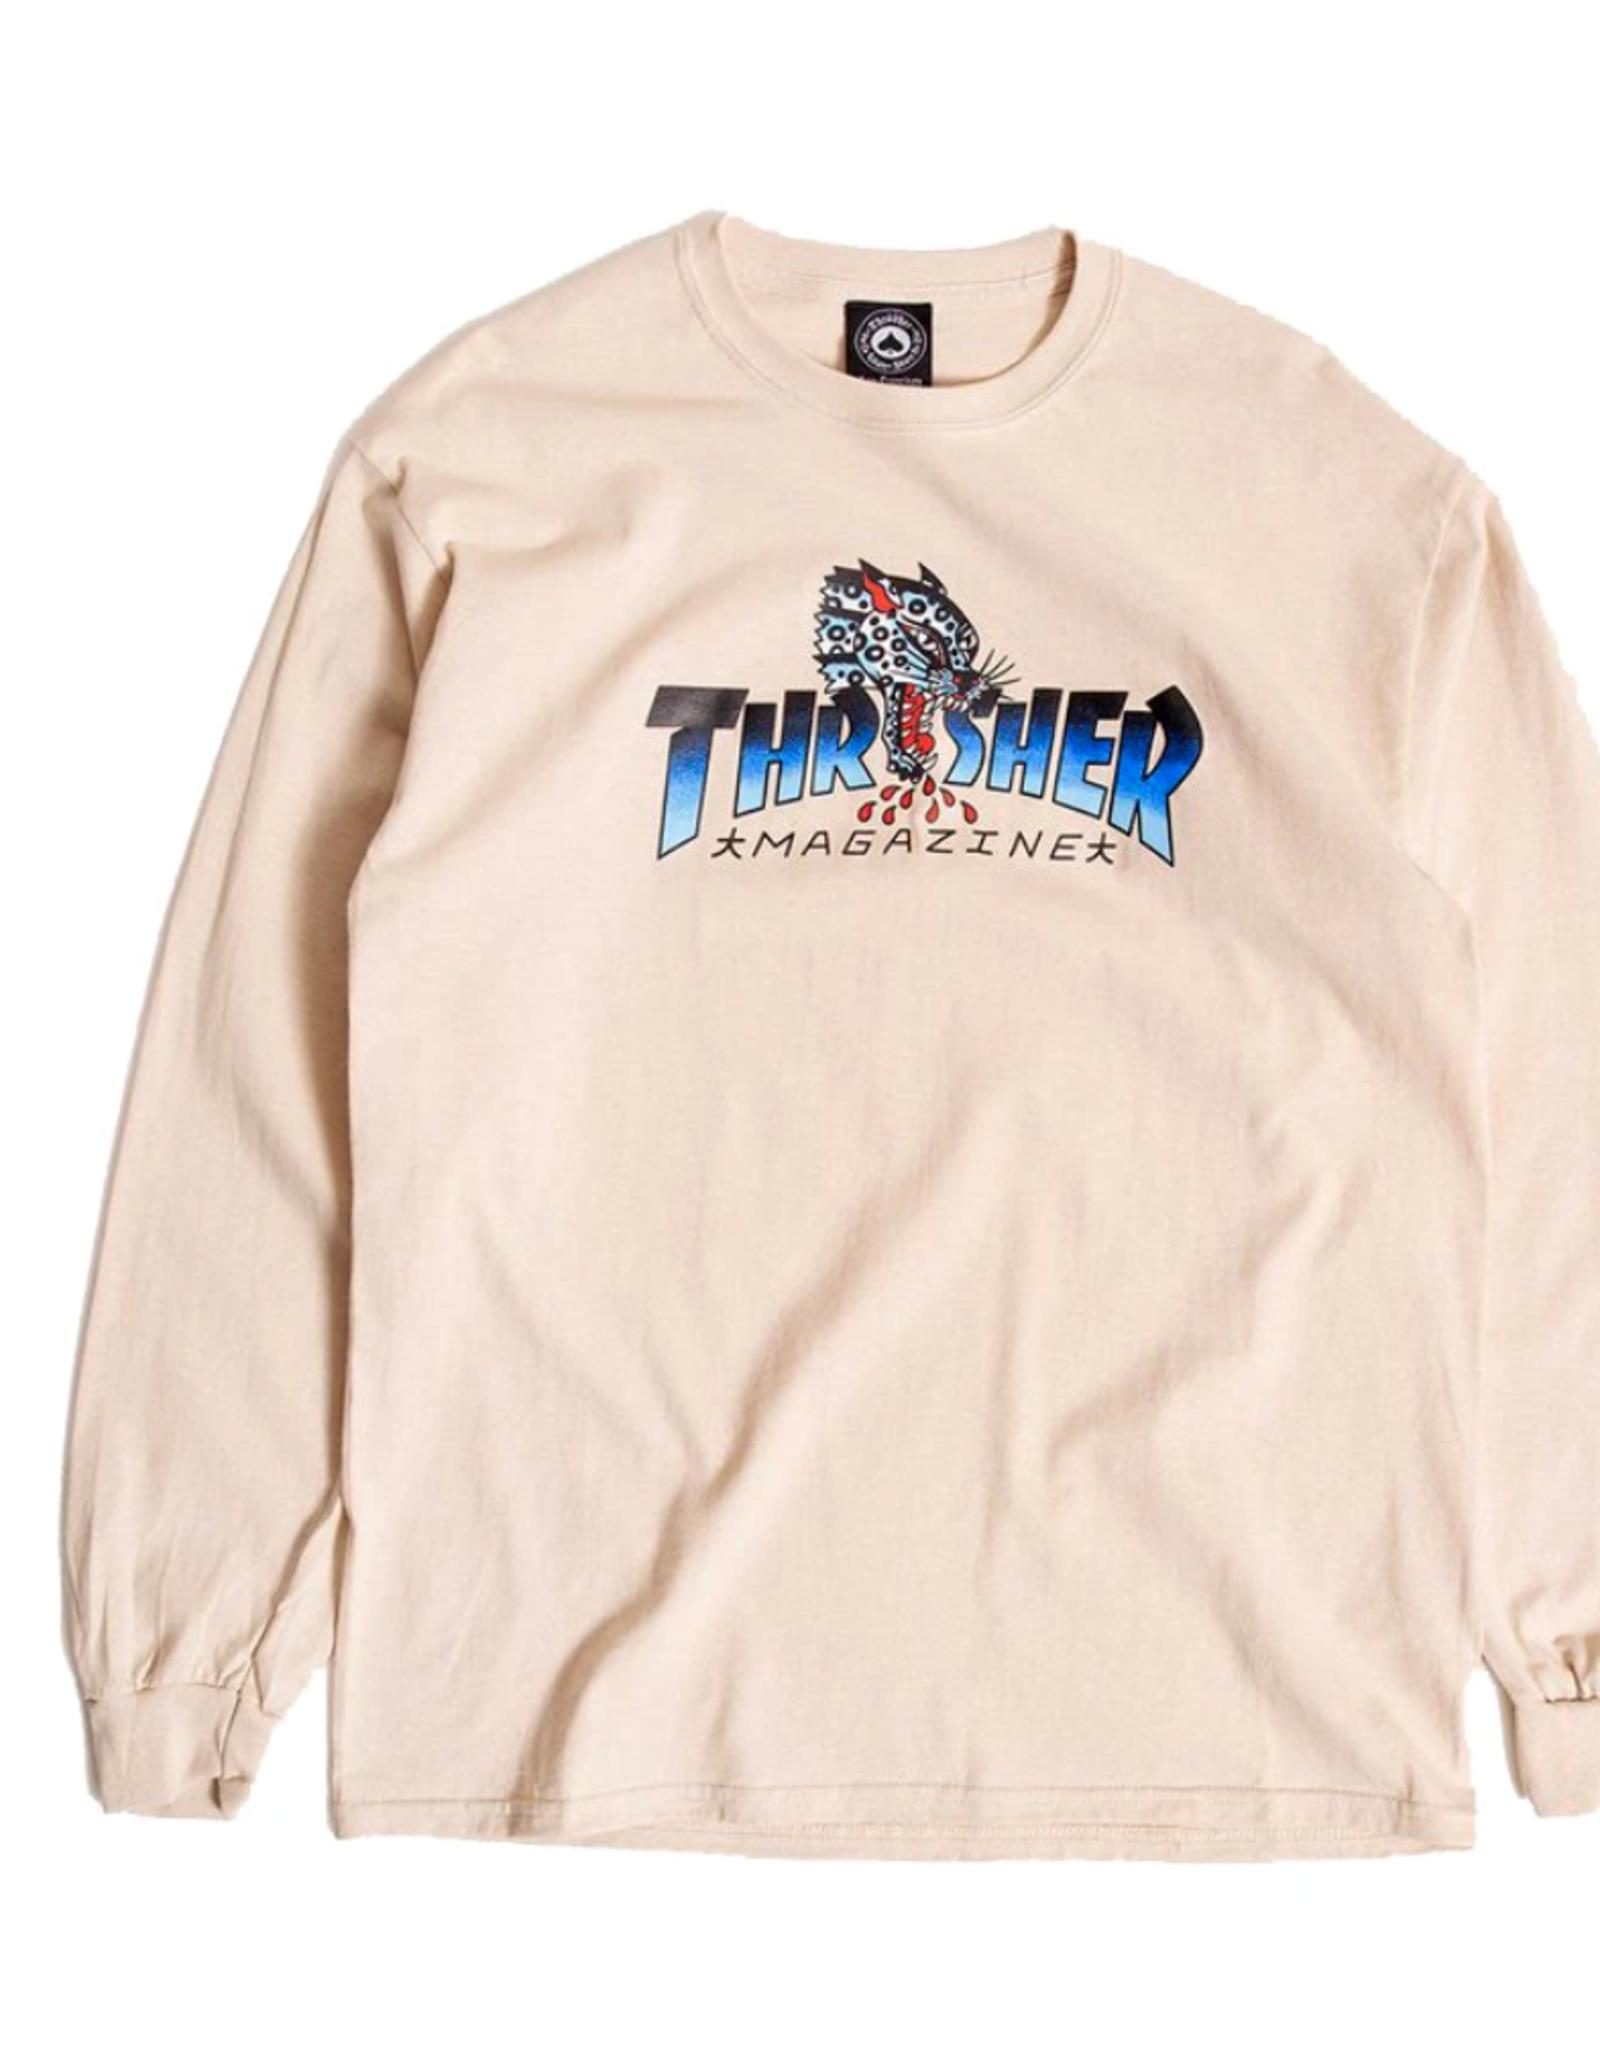 Thrasher THRASHER LEOPARD MAG L/S TEE